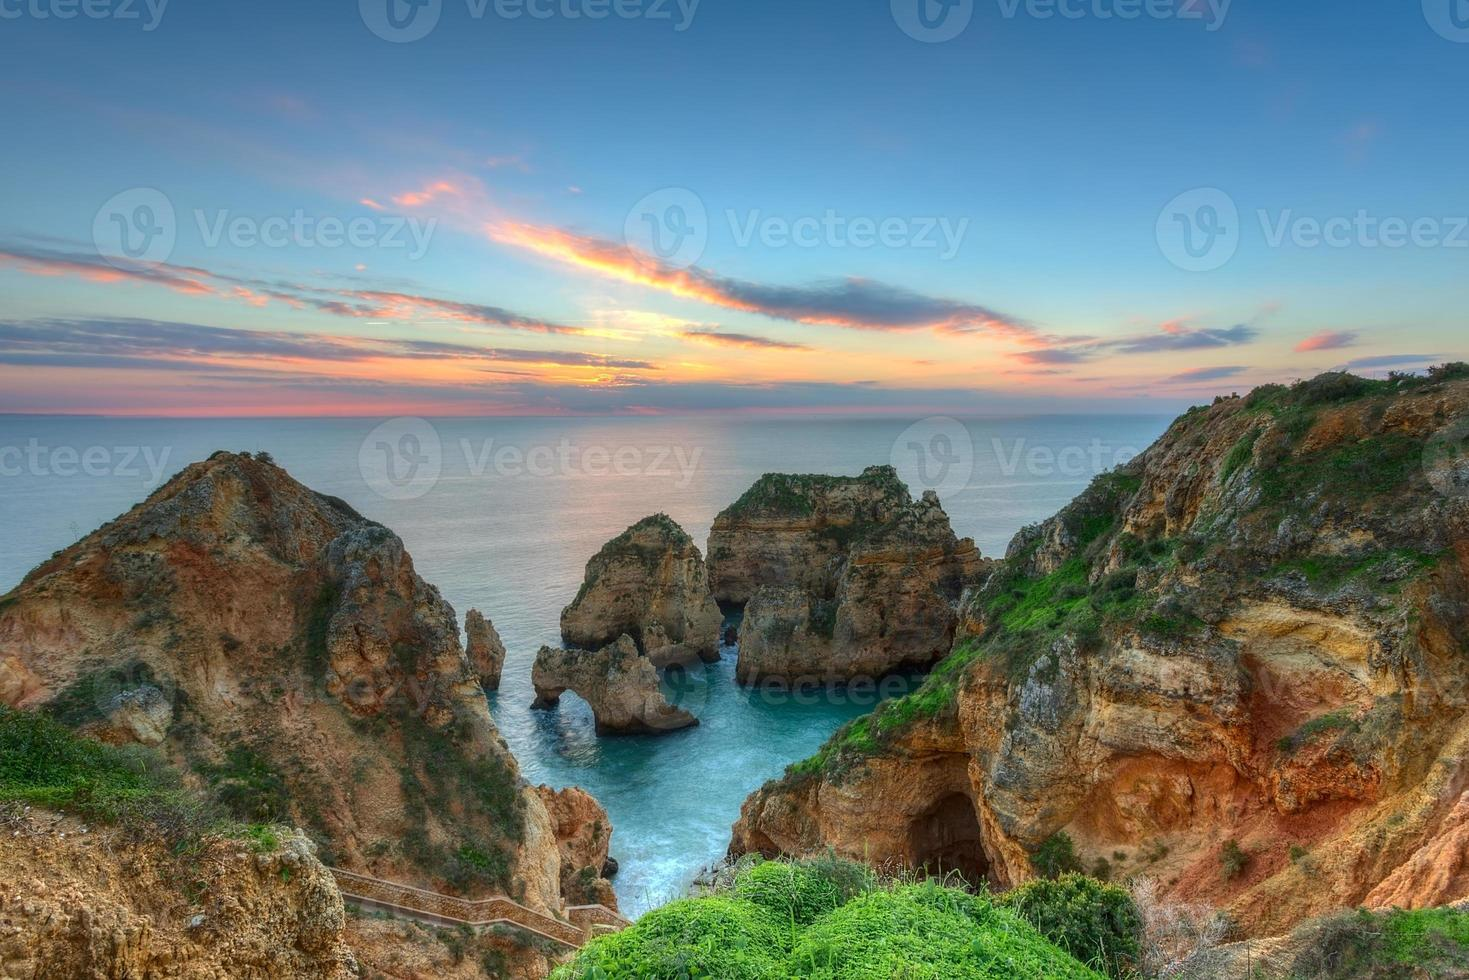 schöne Seelandschaft Sonnenaufgang. Lagos, Portugal, Algarve. foto